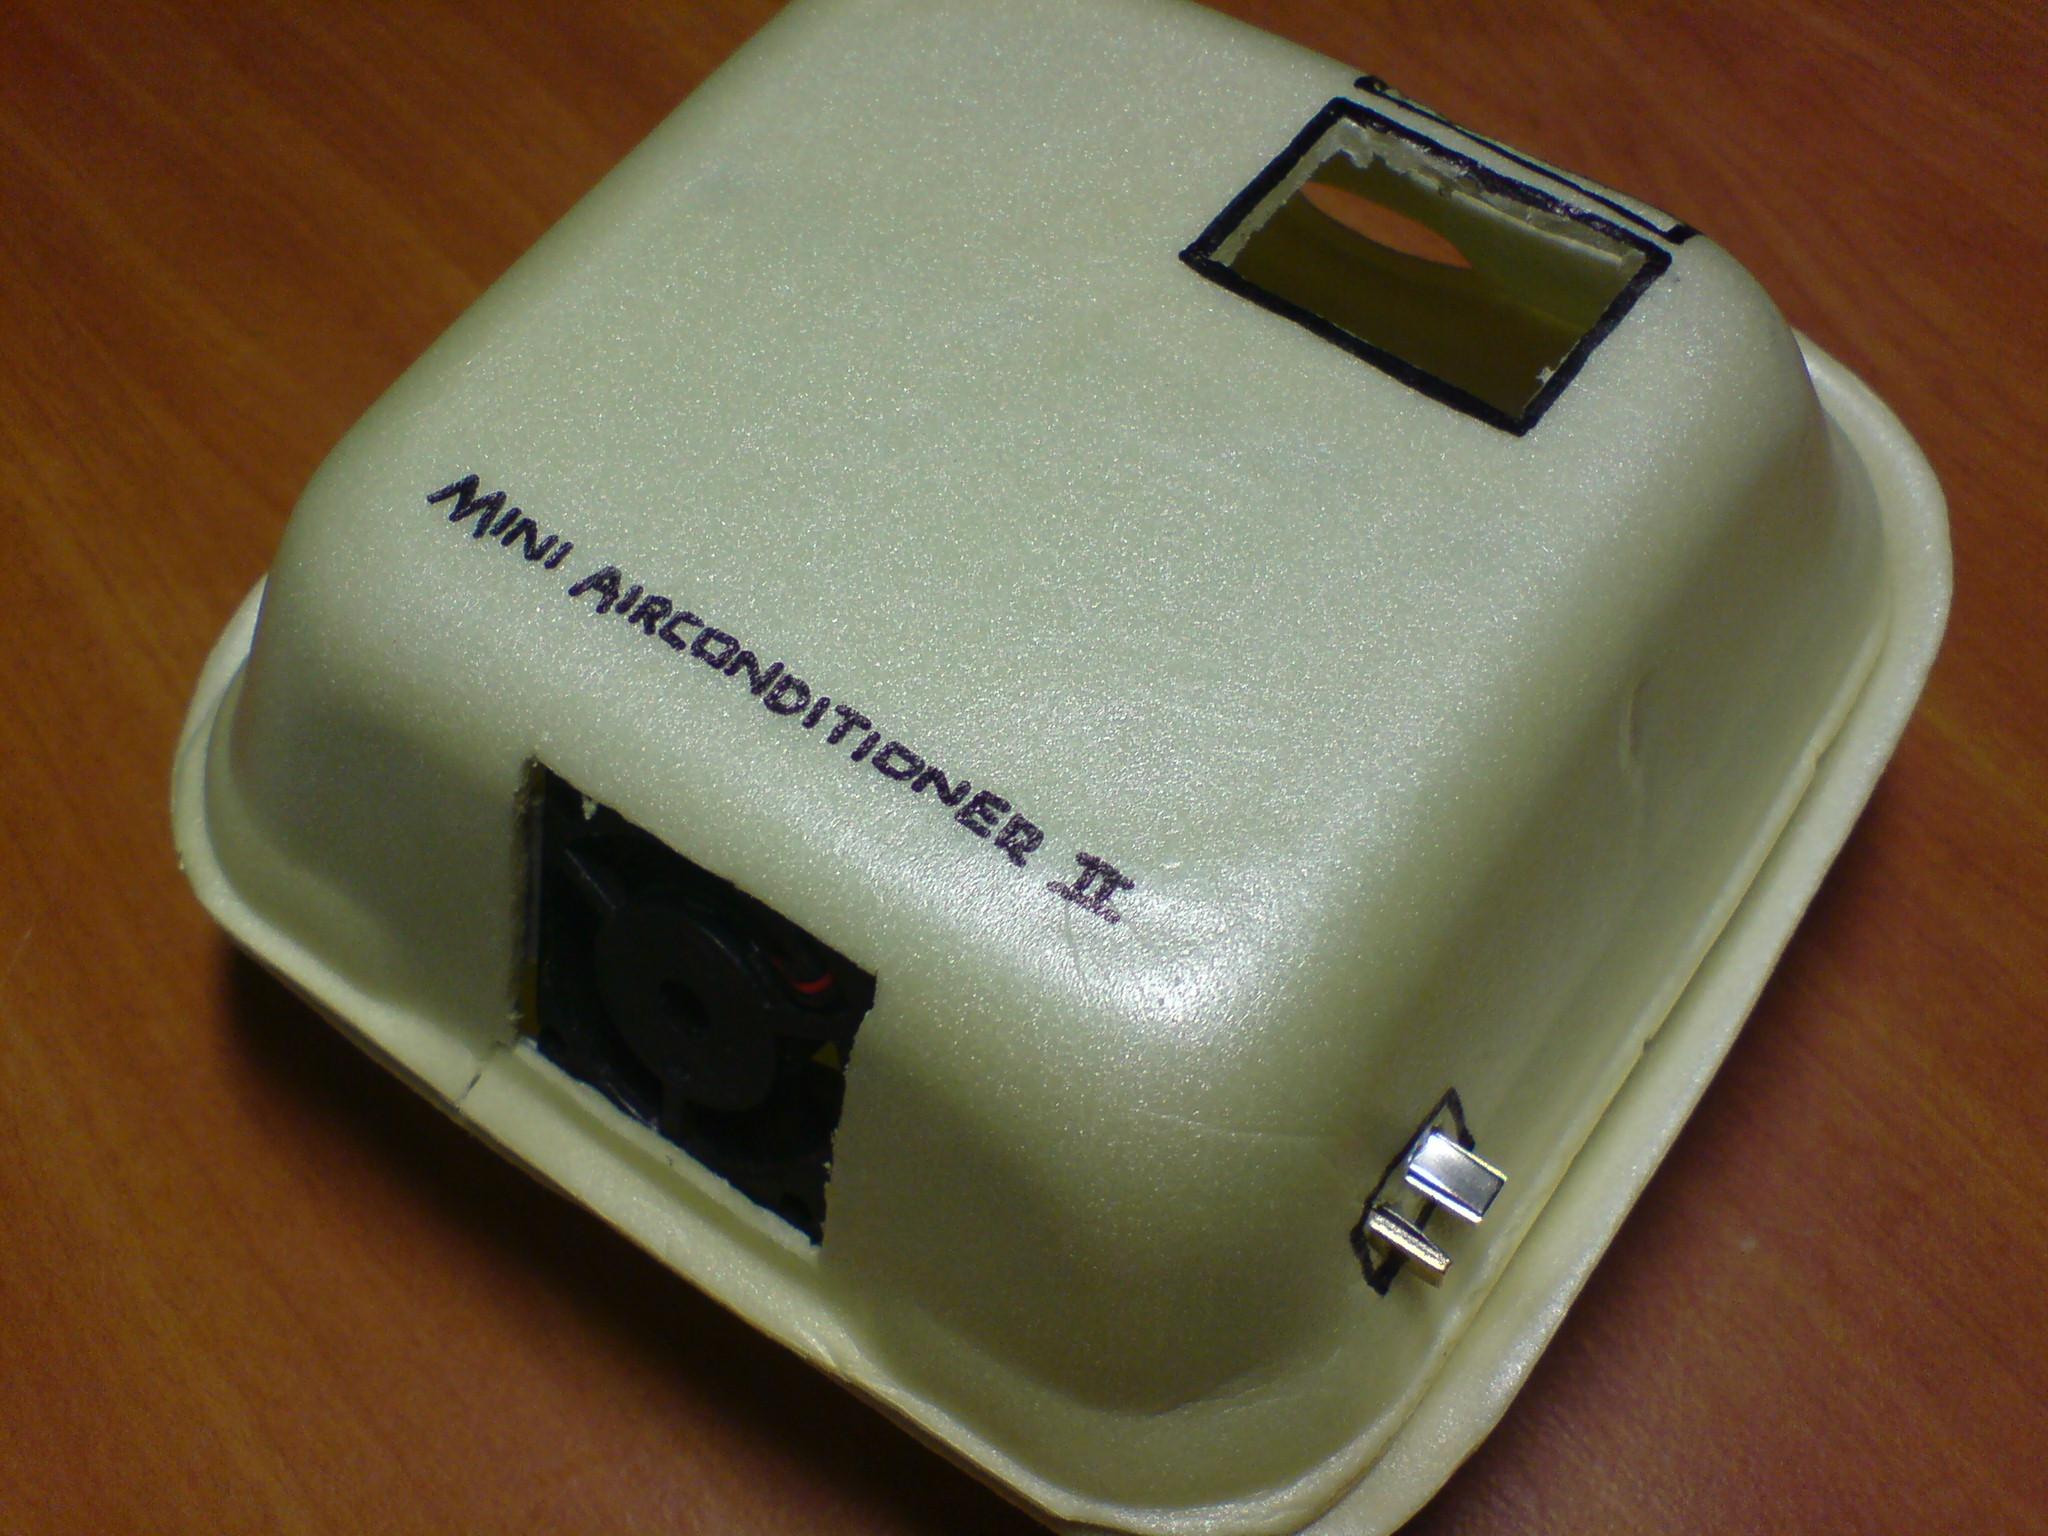 Mini Desktop AirConditioner